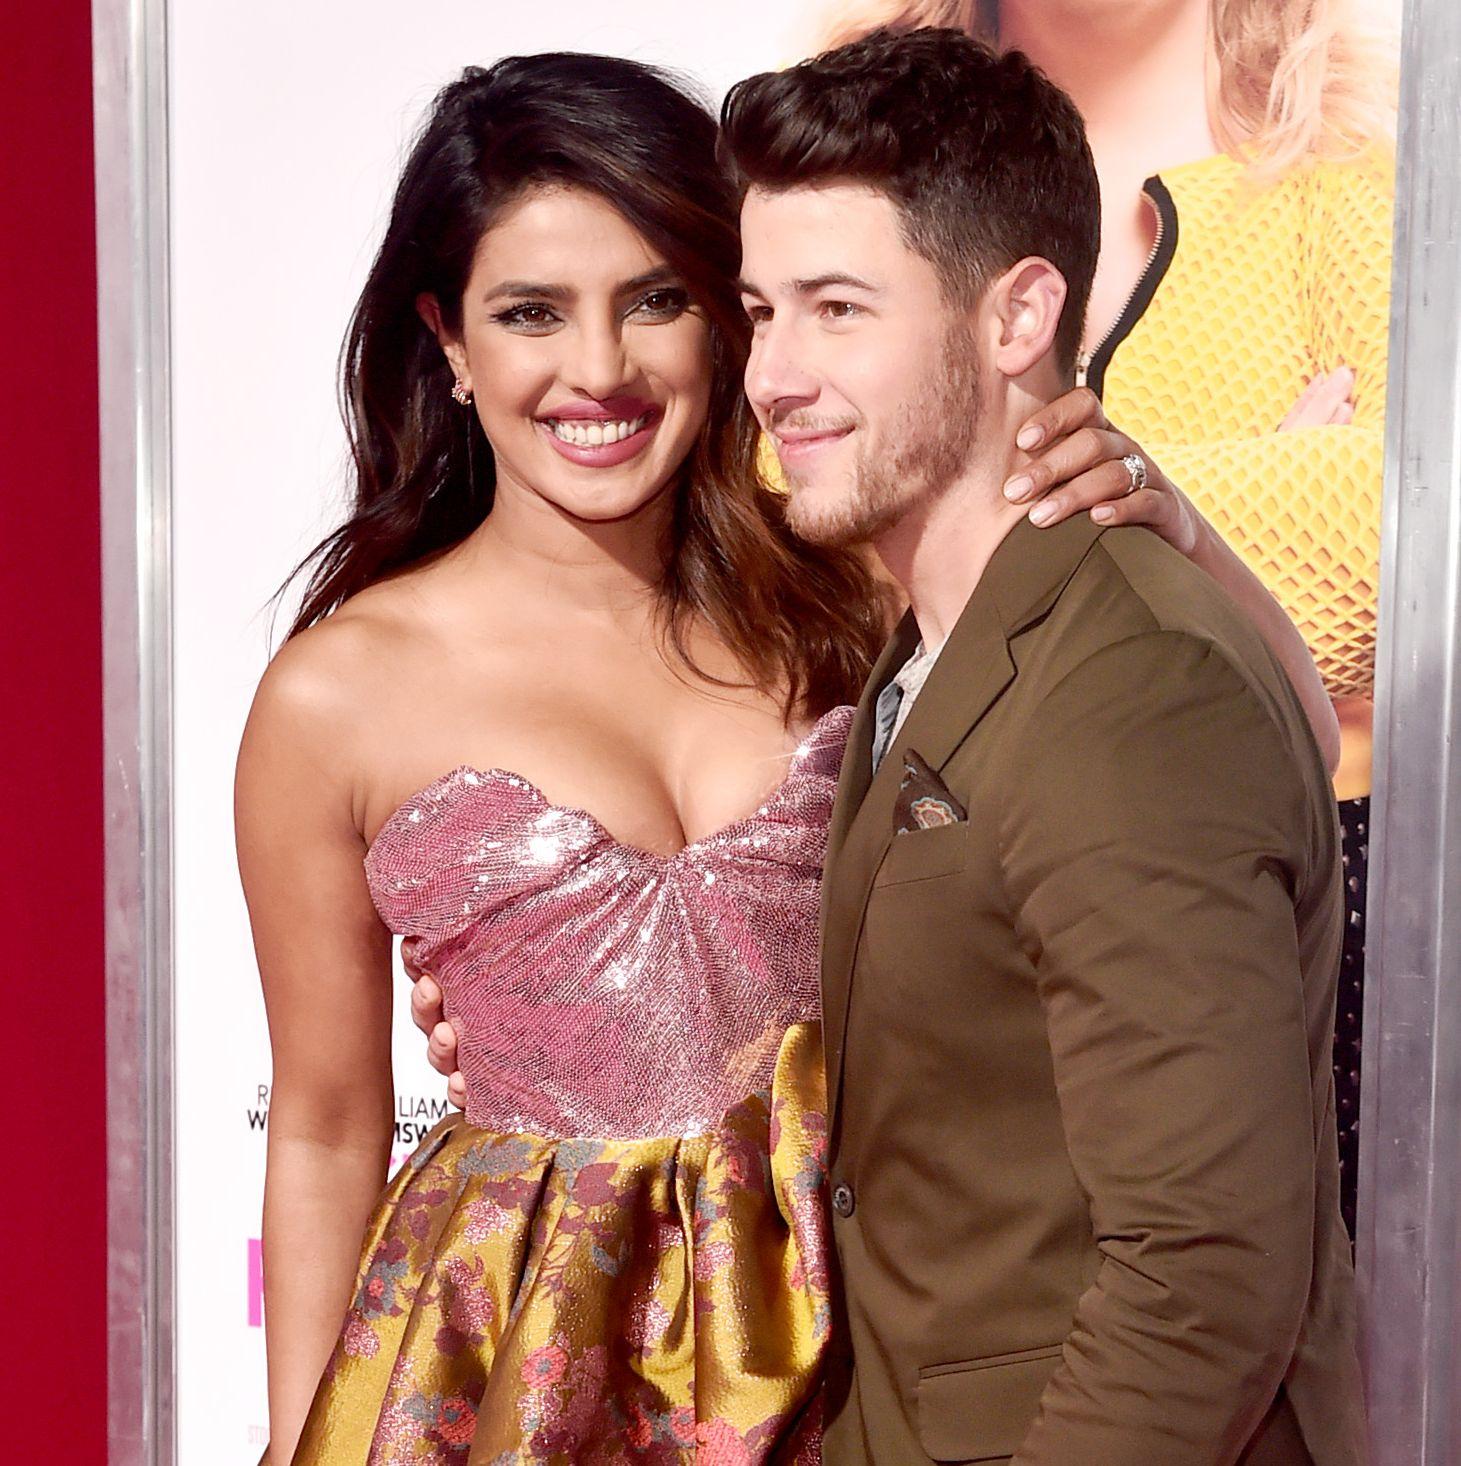 Priyanka Chopra and Nick Jonas Were the Epitome of Honeymoon Period at Her Movie Premiere